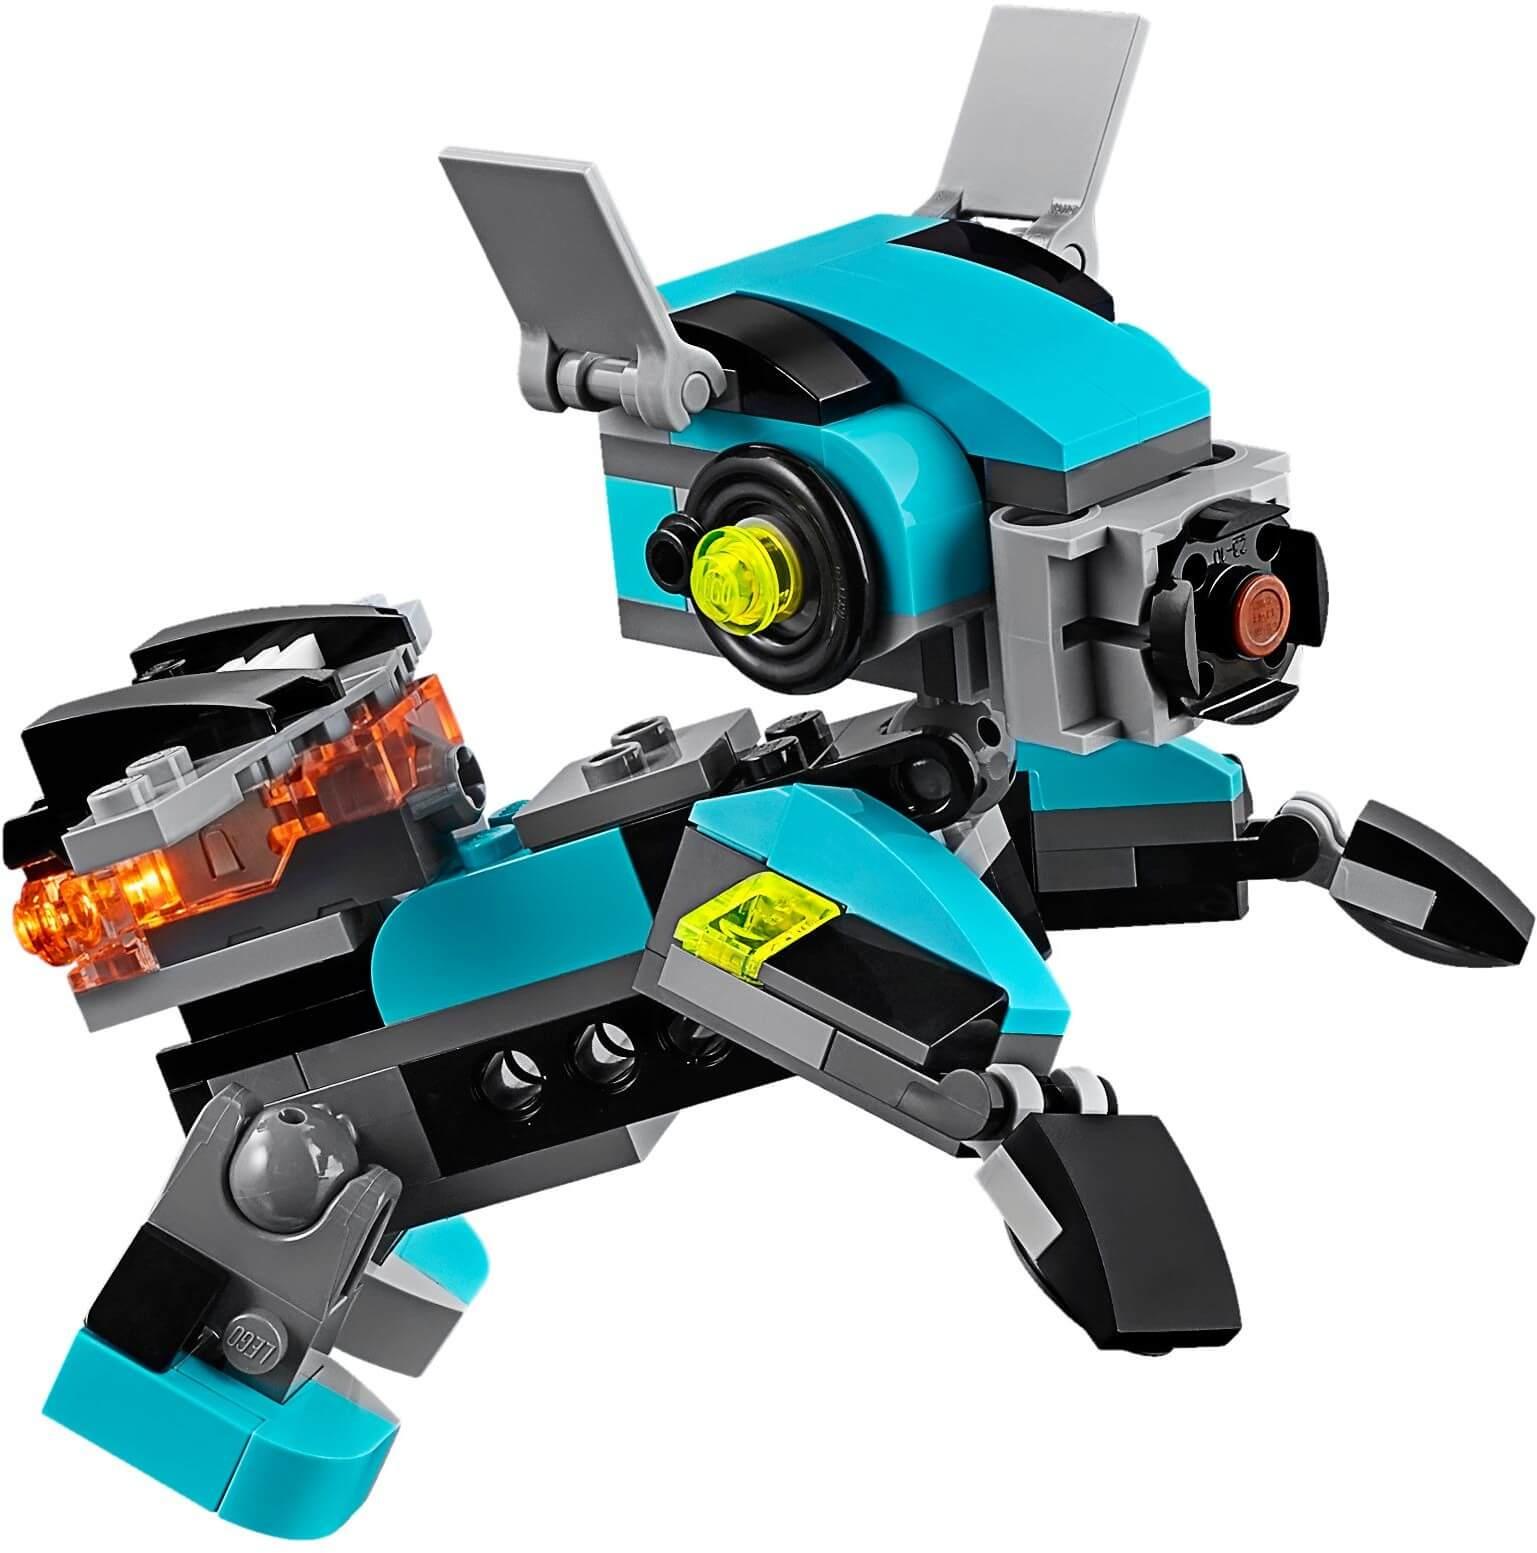 Mua đồ chơi LEGO 31062 - LEGO Creator 31062 - Mô Hình Robot 3-trong-1 (LEGO 31062 Robo Explorer)